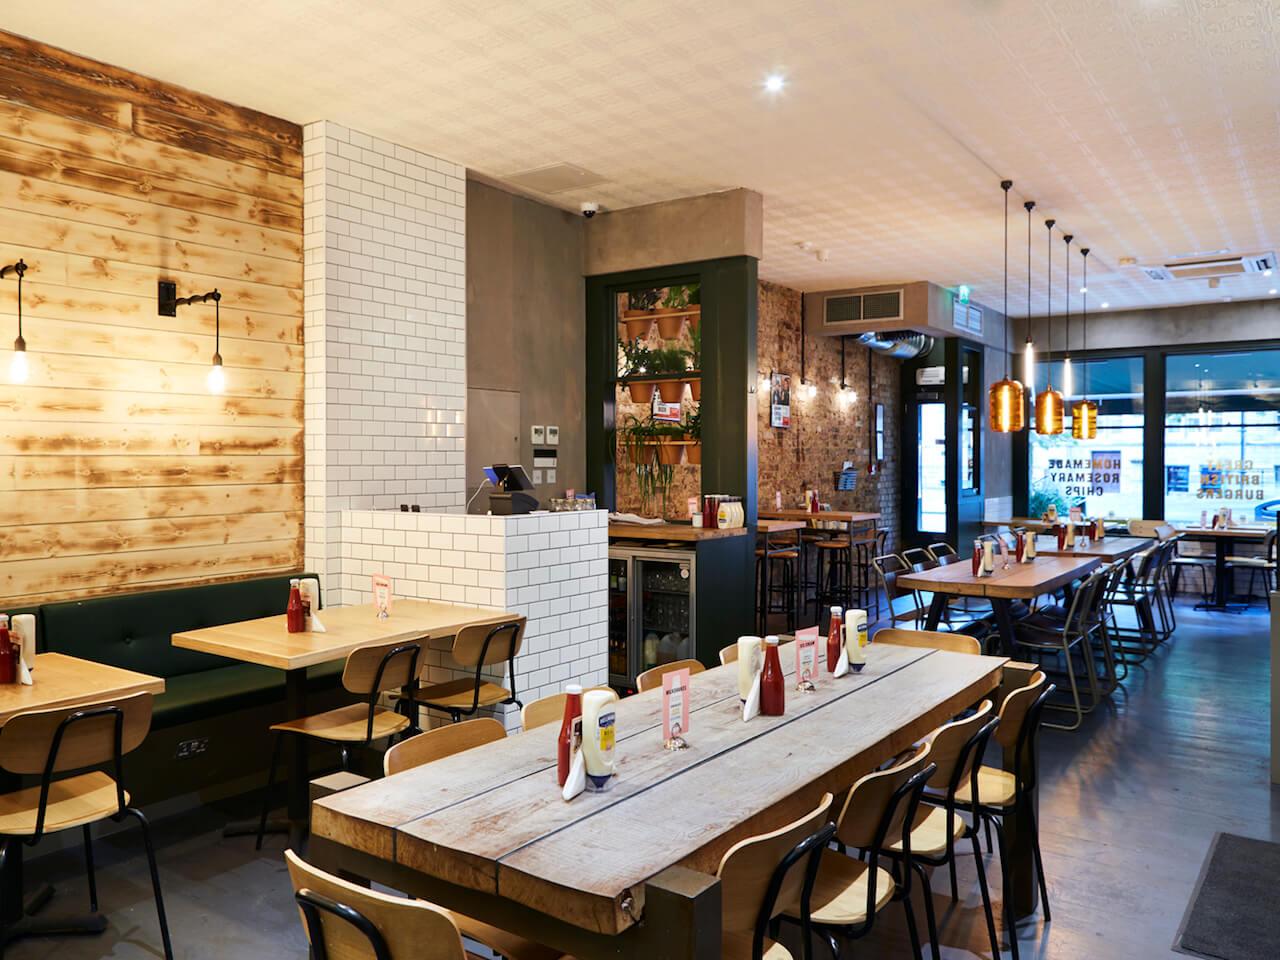 Inside the new Ealing Honest Burgers